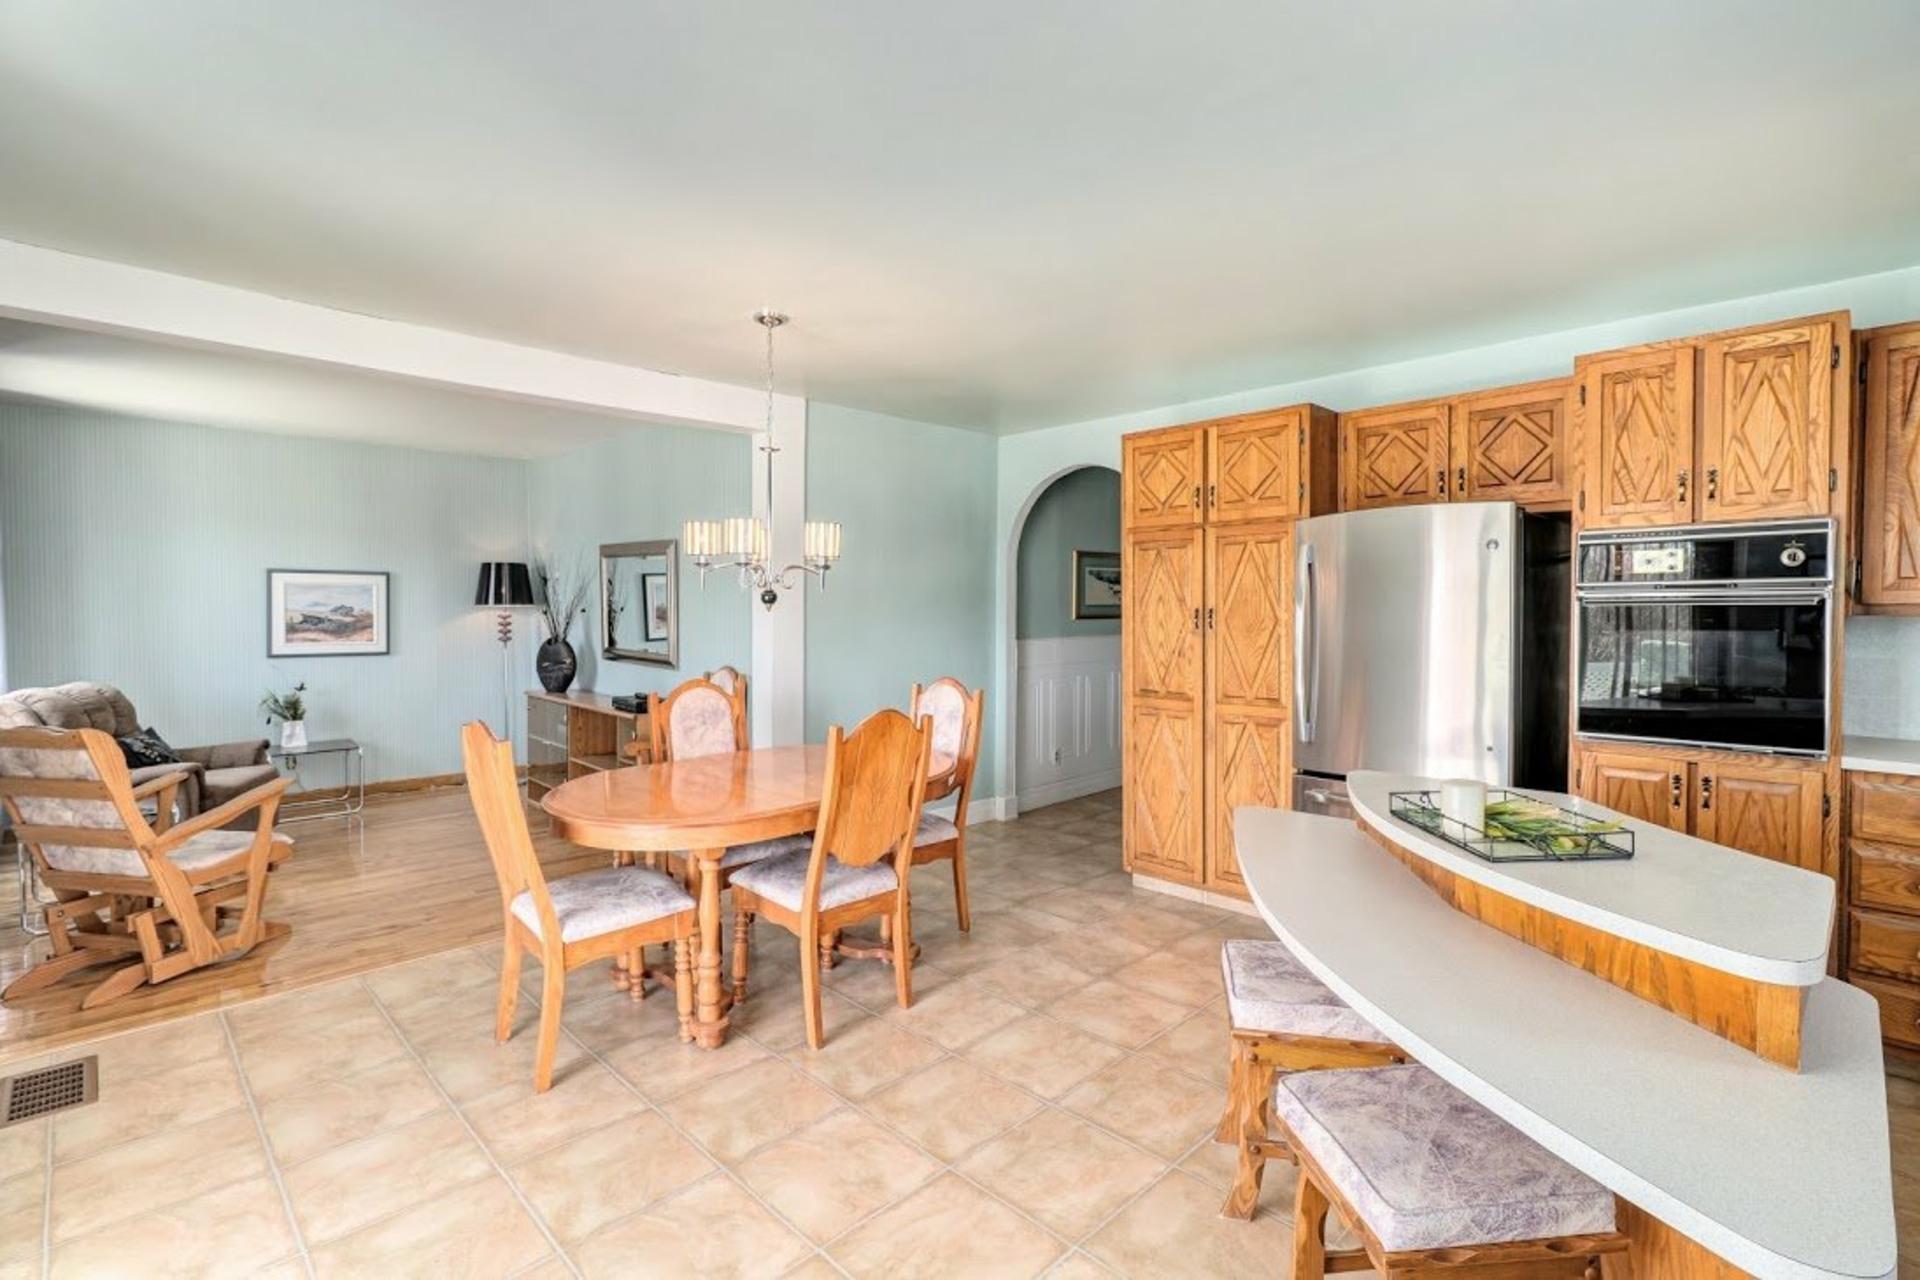 image 4 - House For sale Notre-Dame-des-Prairies - 9 rooms